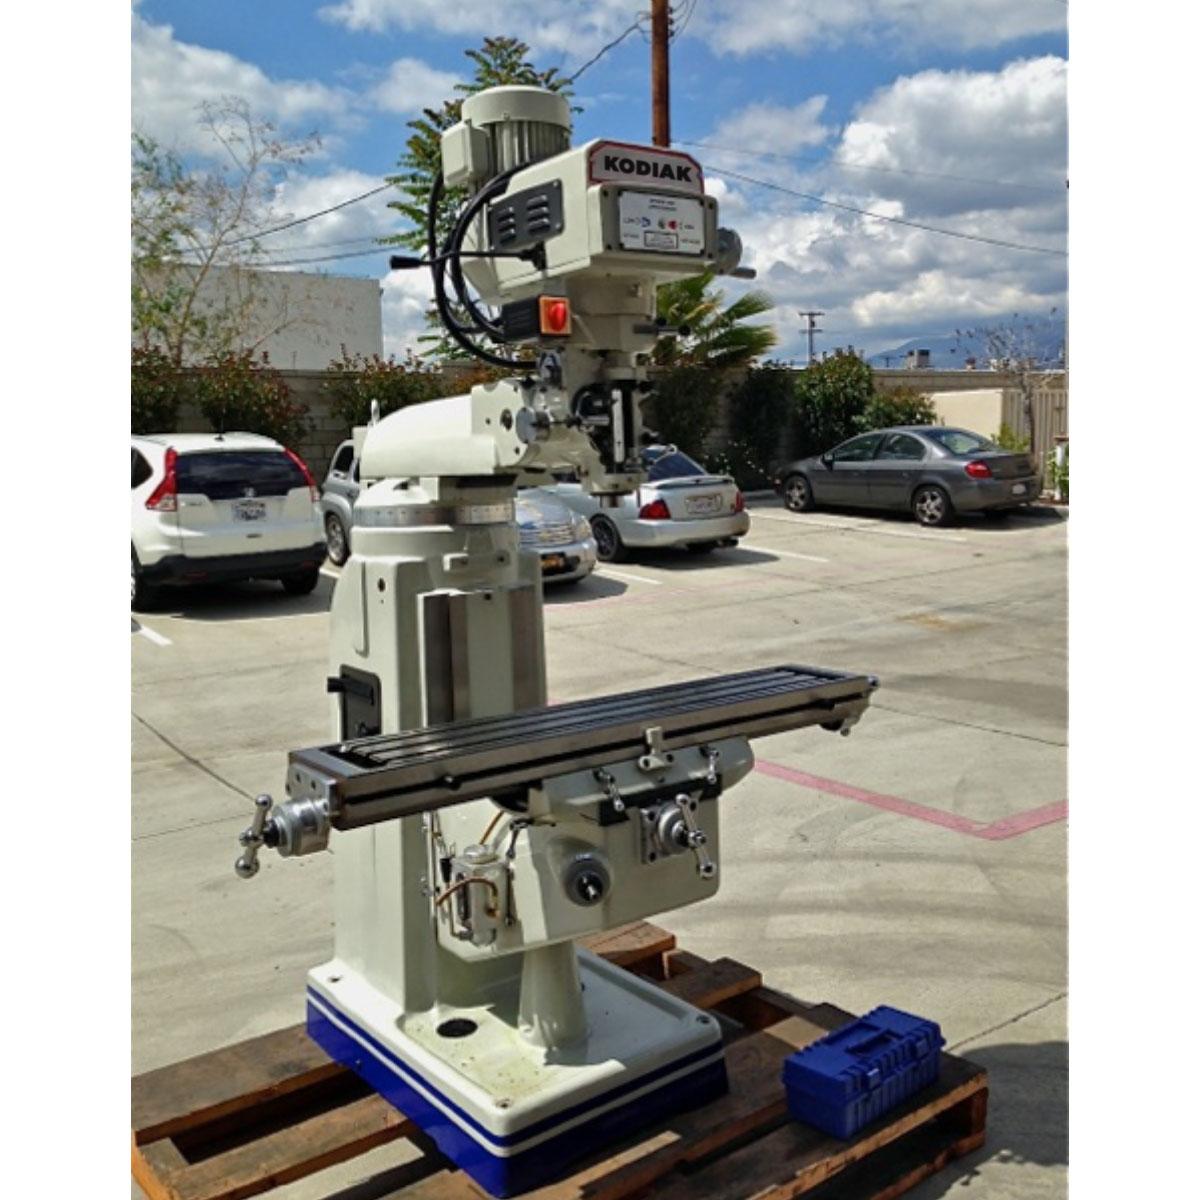 Milling Machine For Sale >> 9 X 49 New Kodiak Vertical Milling Machine Model Kbpv 3949 C